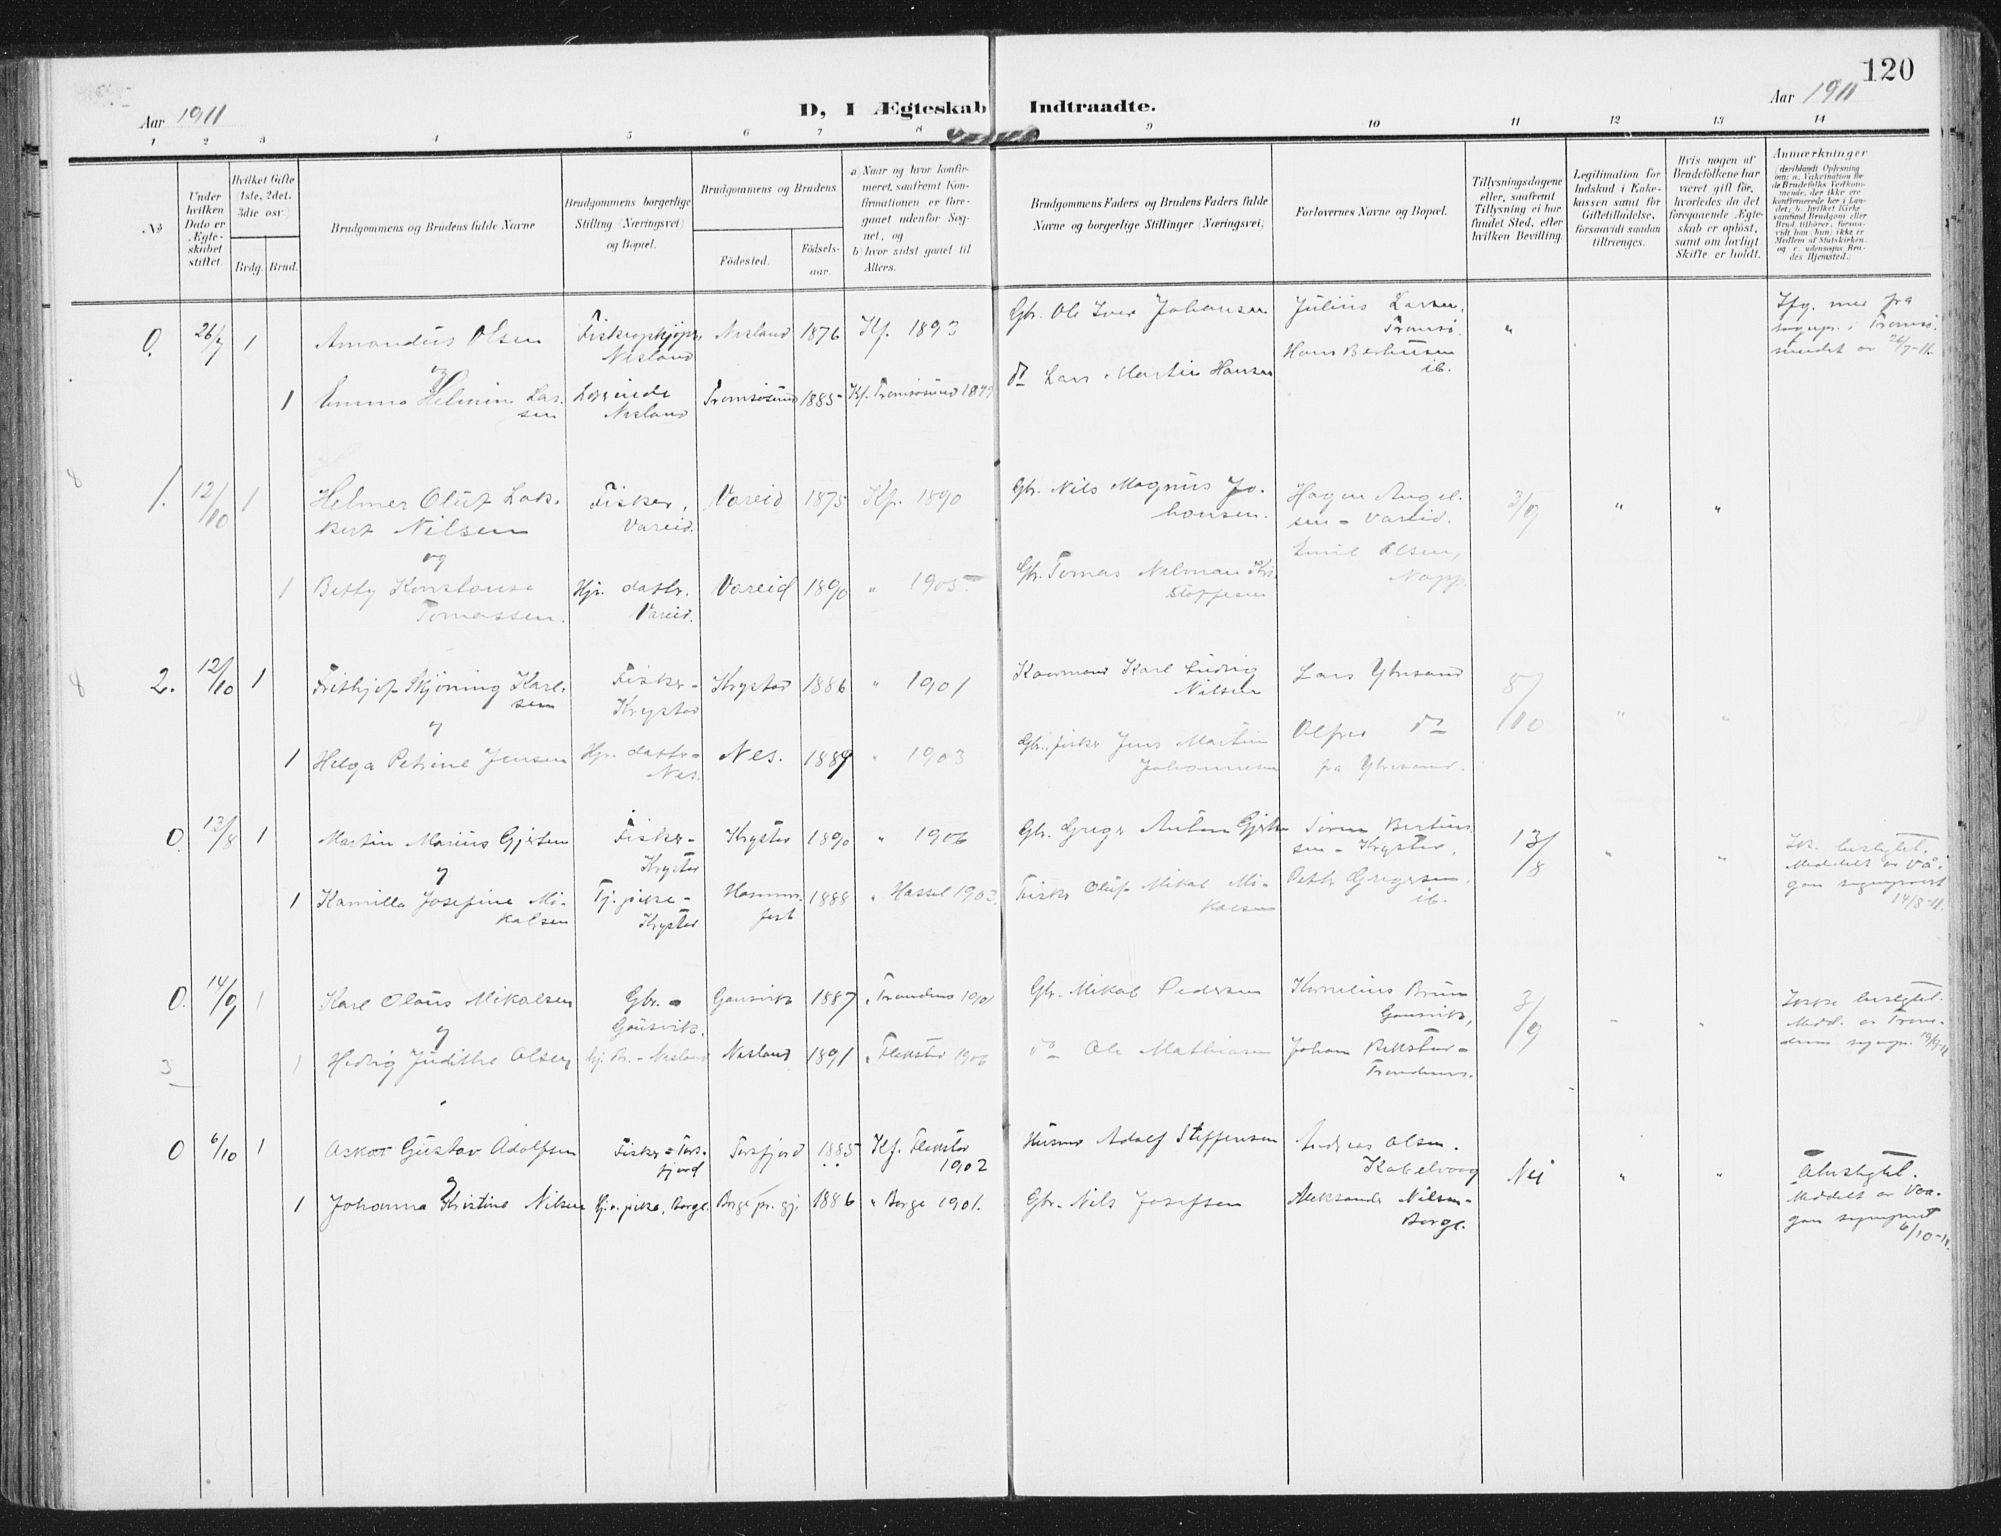 SAT, Ministerialprotokoller, klokkerbøker og fødselsregistre - Nordland, 885/L1206: Ministerialbok nr. 885A07, 1905-1915, s. 120